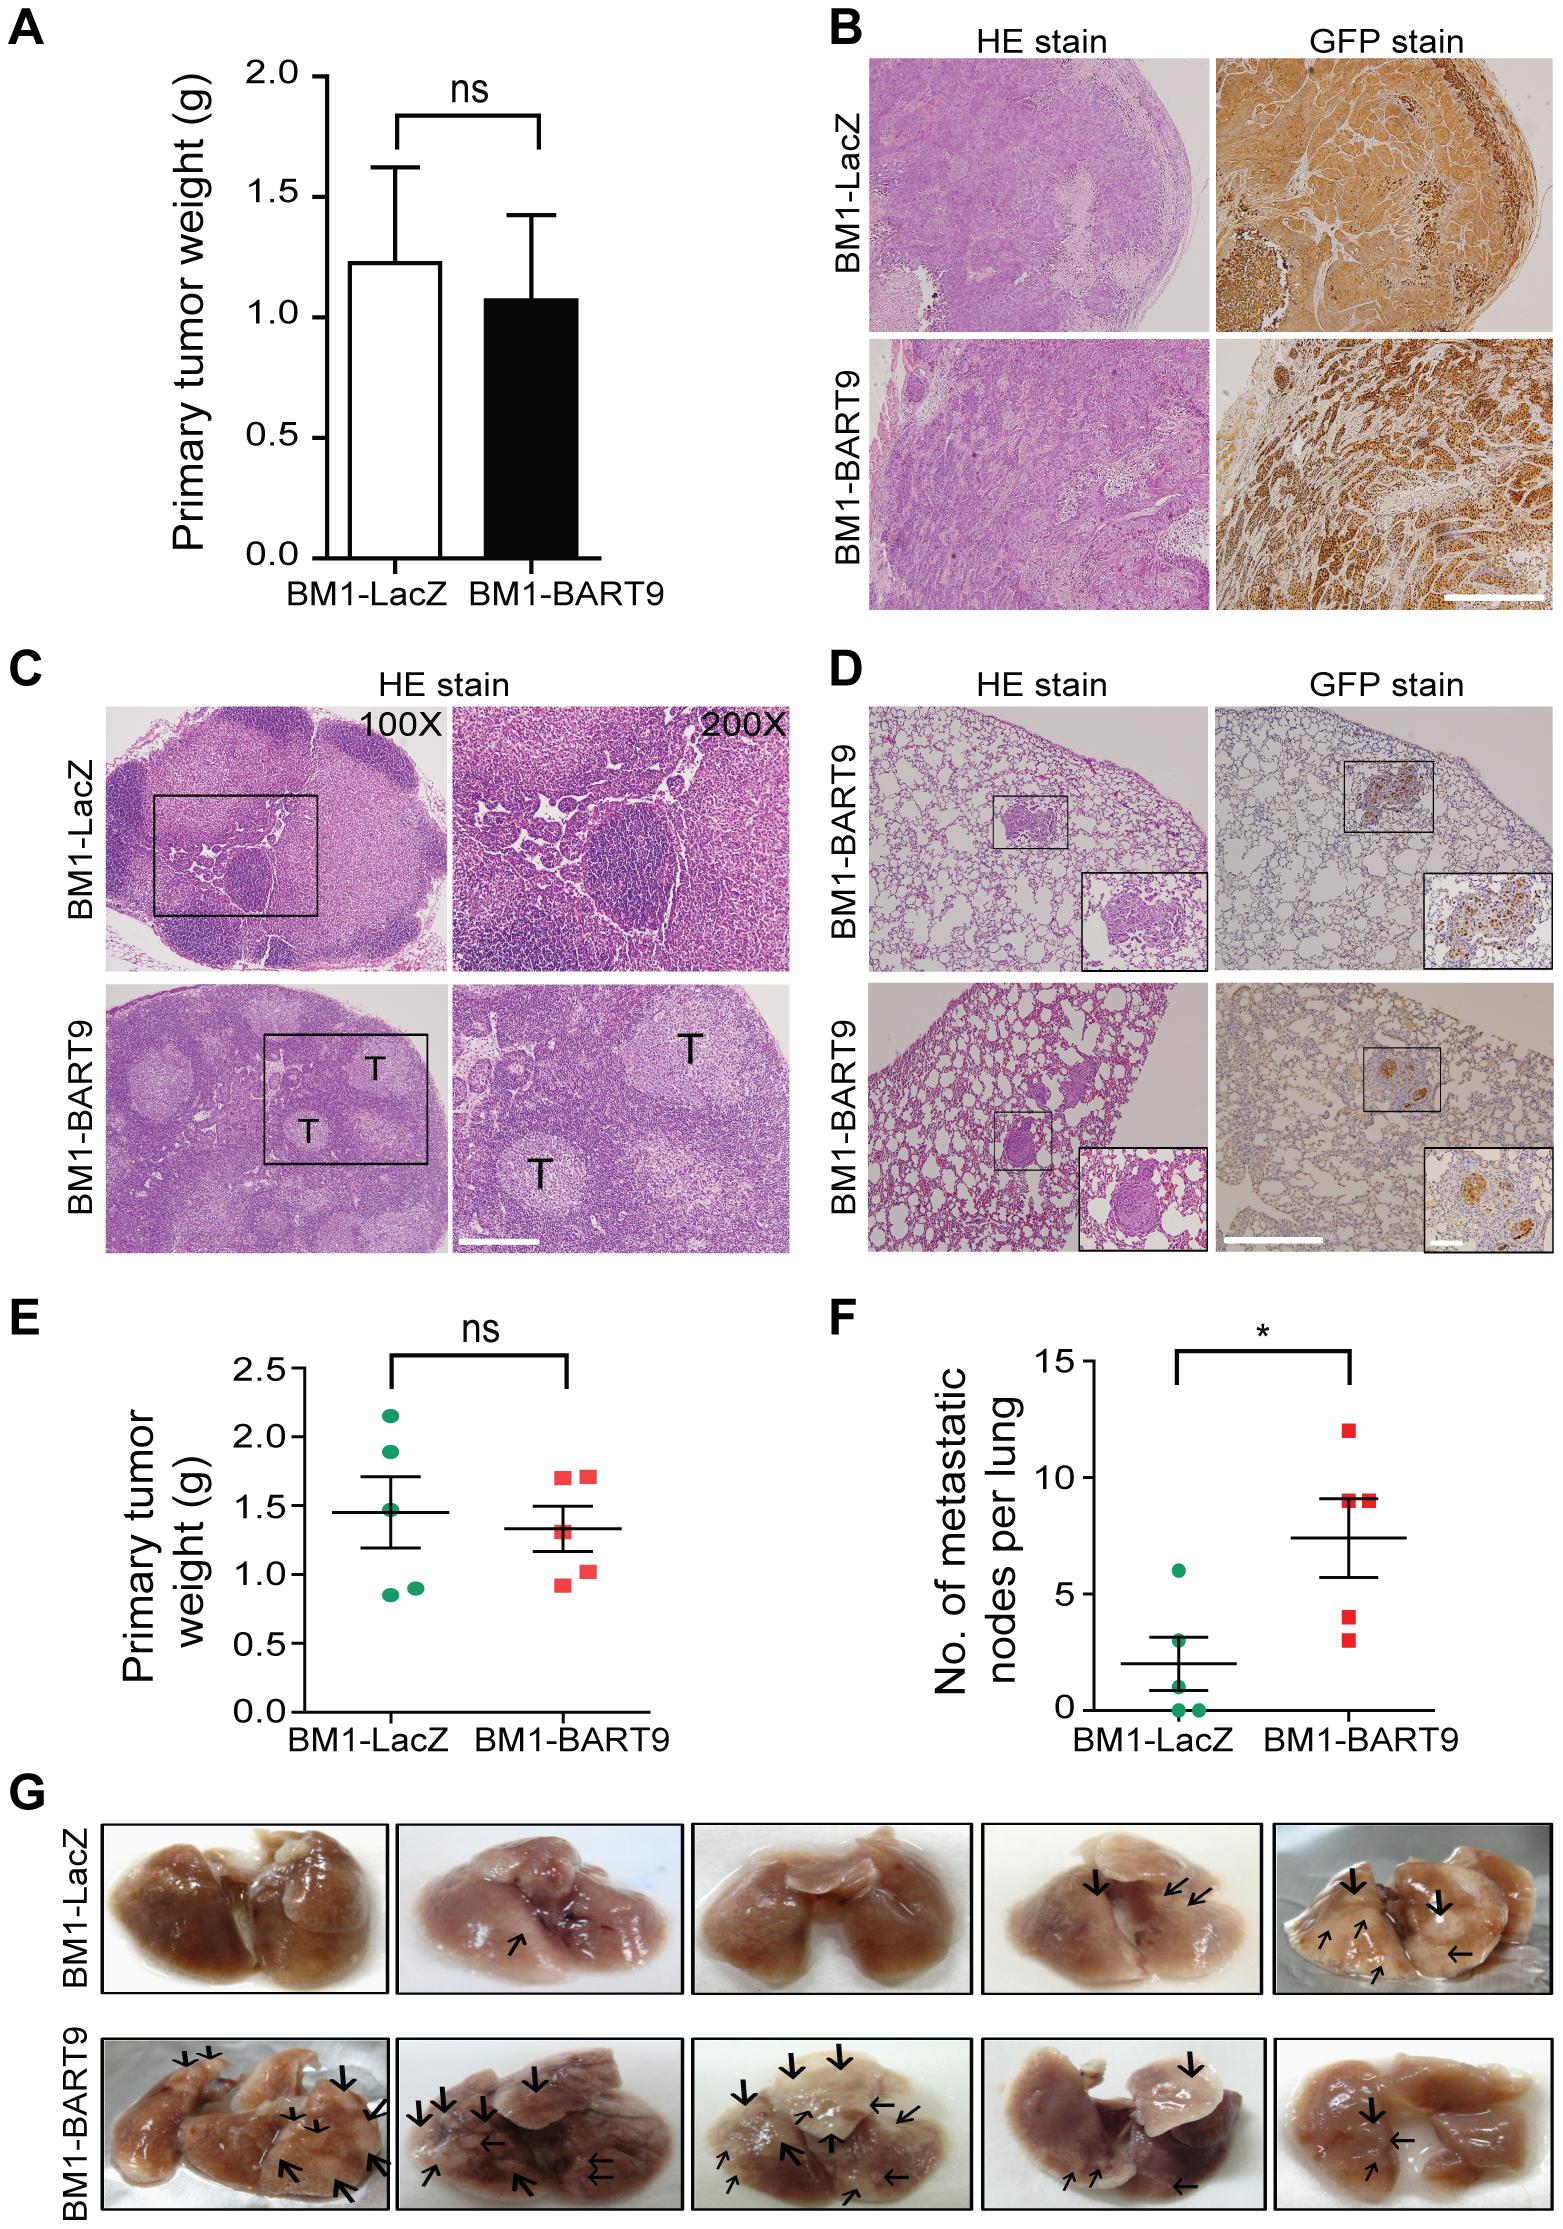 miR-BART9 enhances the metastatic activity of EBV-negative NPC cells <i>in vivo</i>.